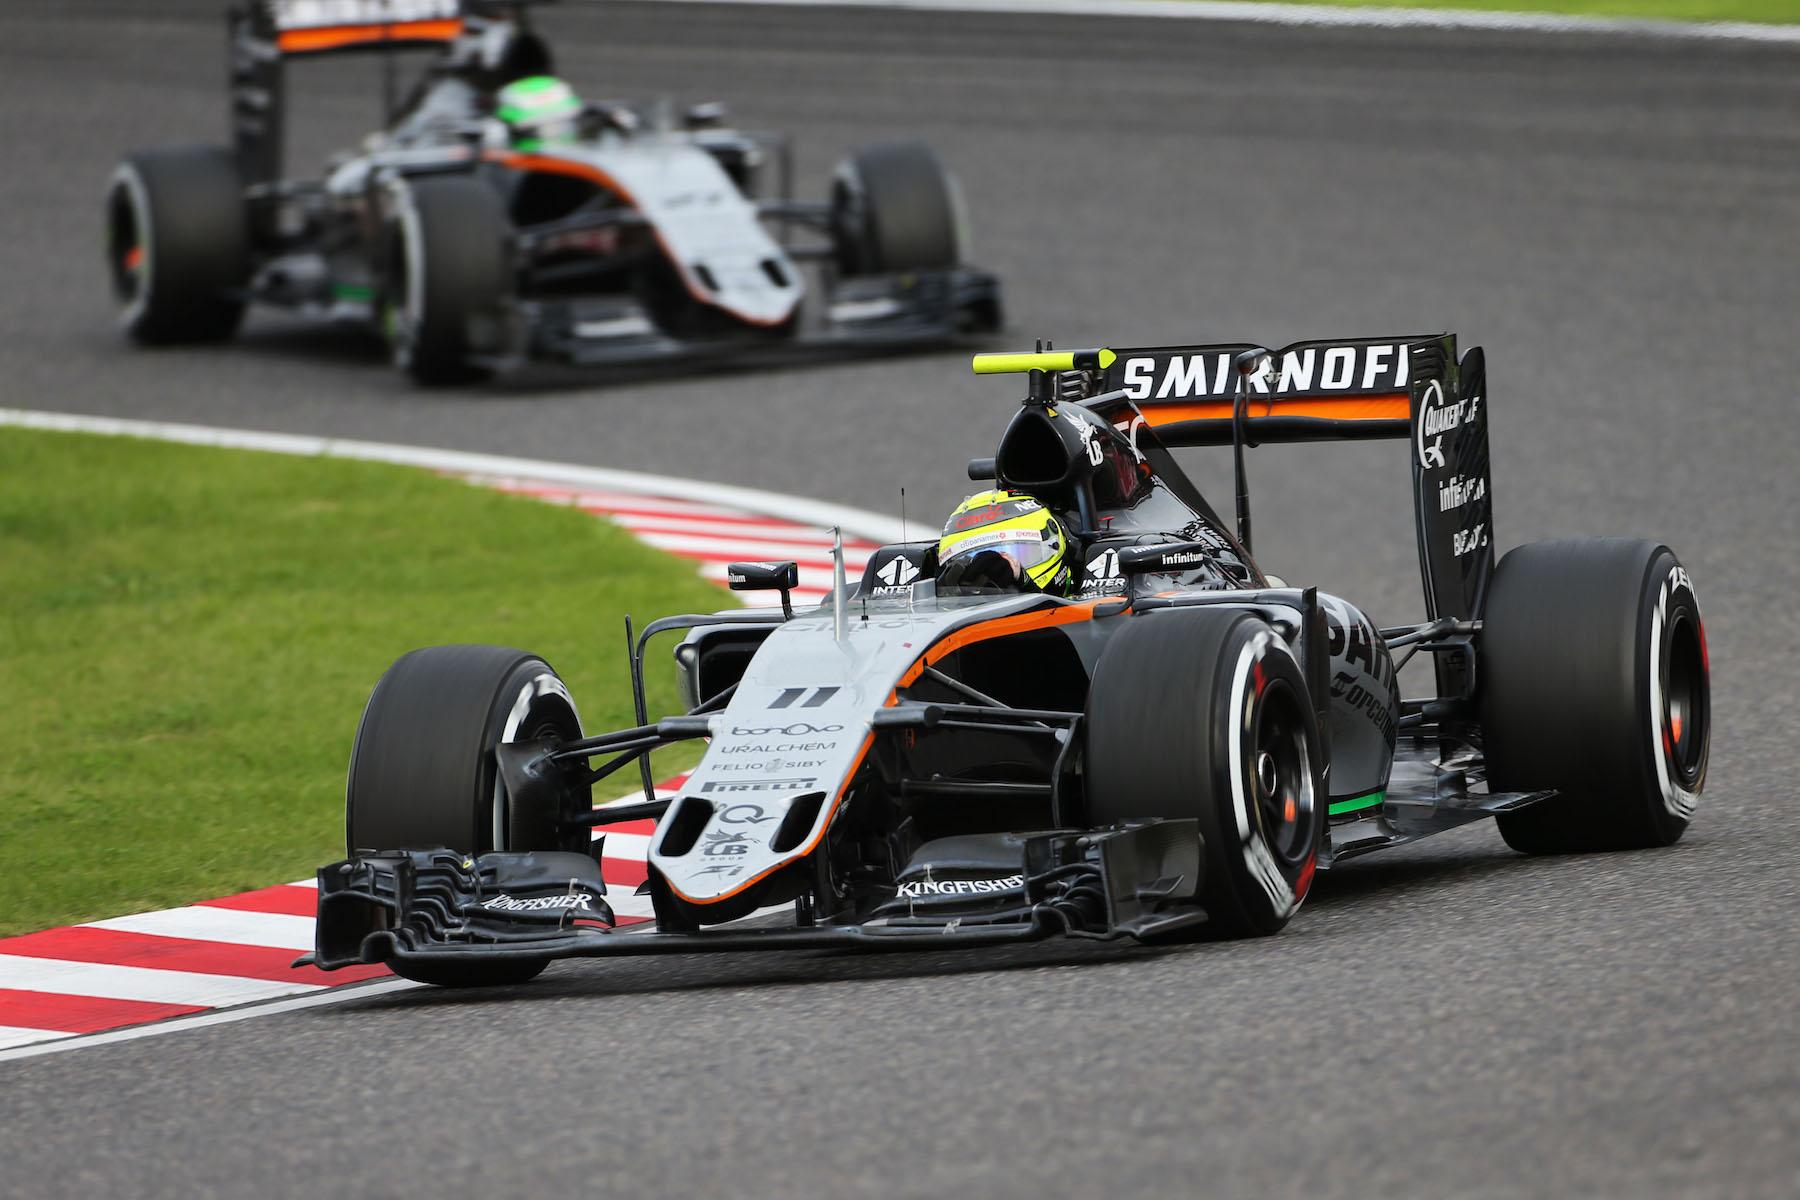 Salracing - Sergio Perez | Sahara Force India F1 Team